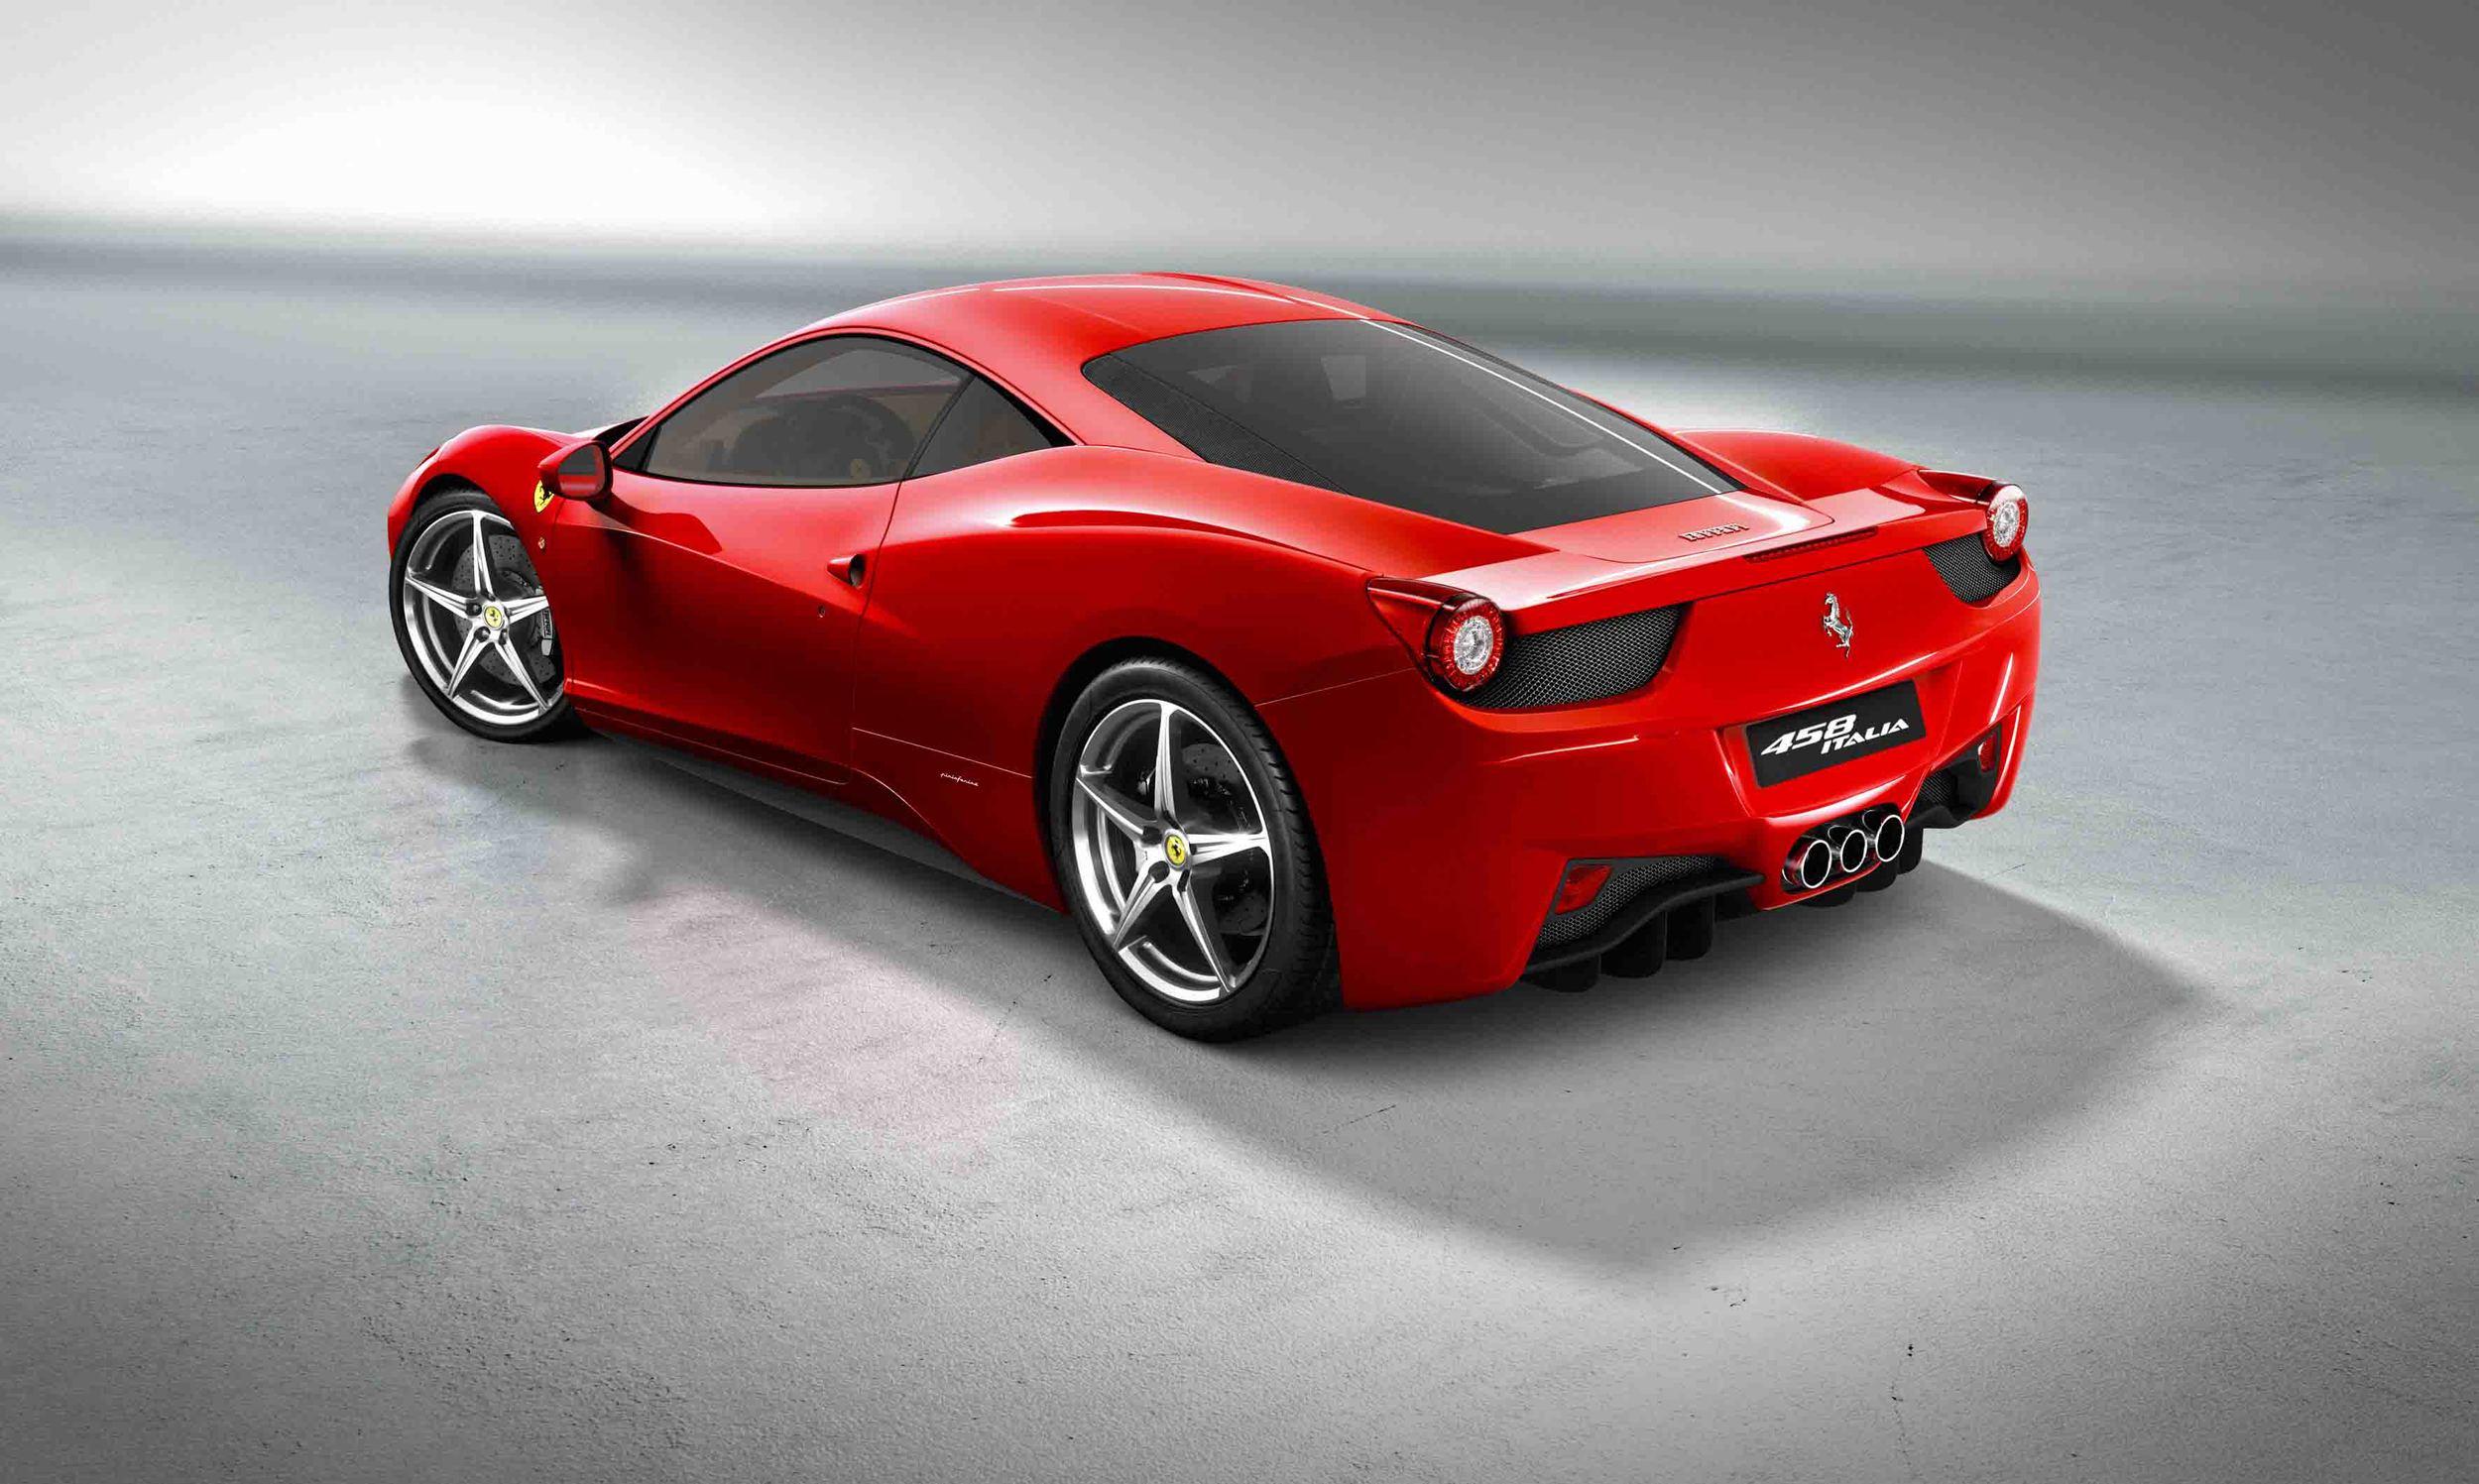 Ferrari 458 Italia (Photo: Courtesy of Ferrari)